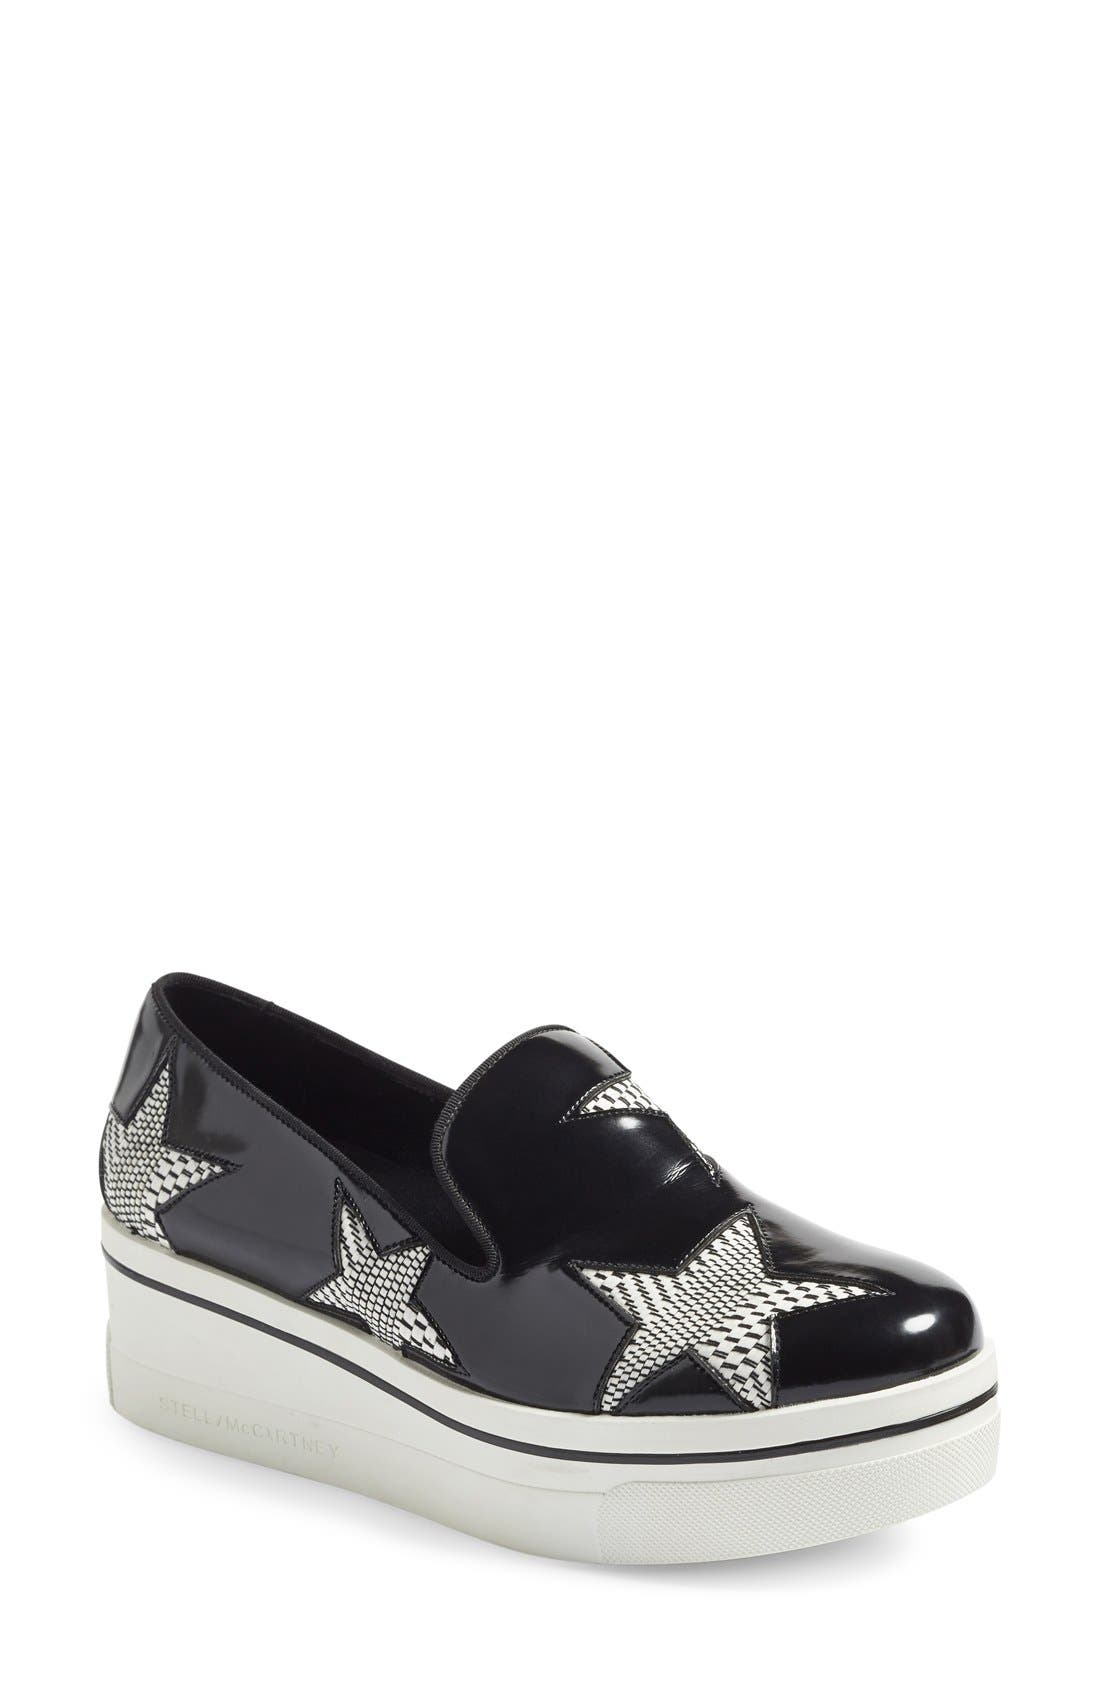 Main Image - Stella McCartney 'Binx Star' Slip-On Platform Sneaker (Women)